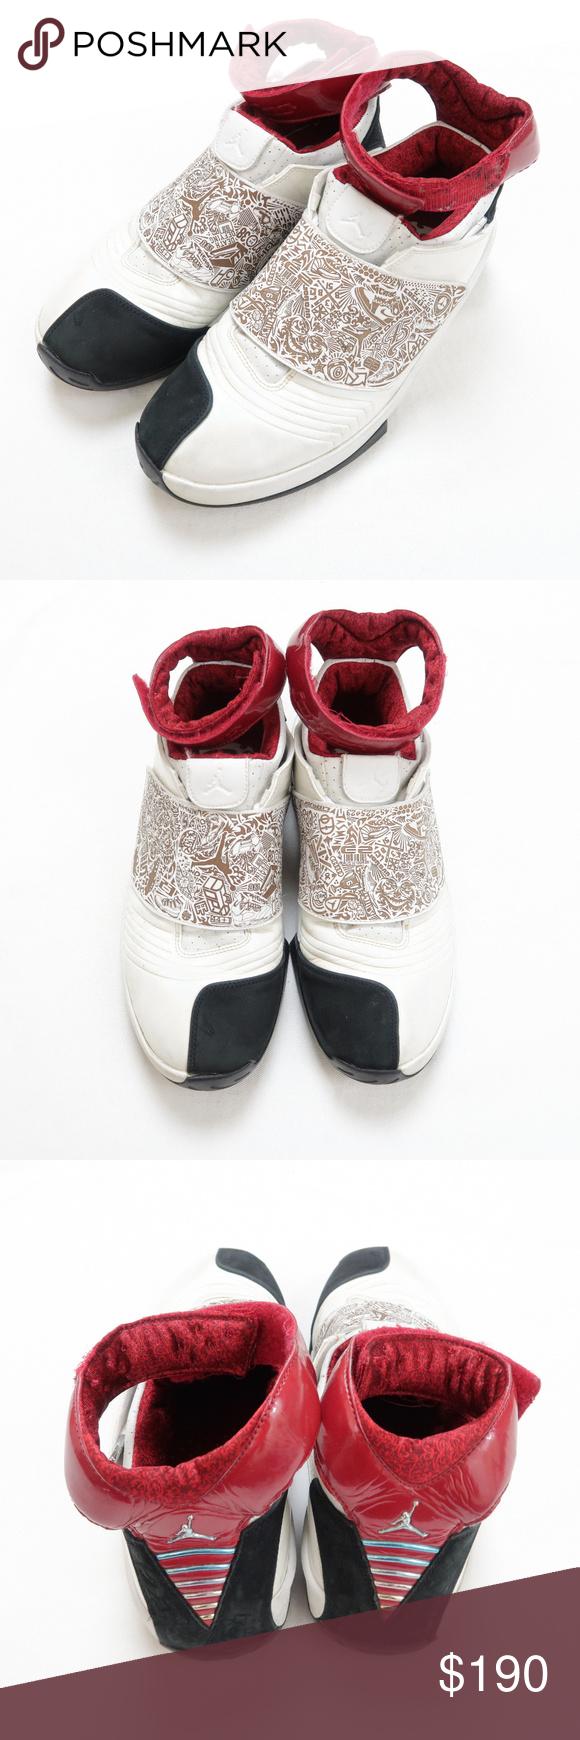 online store 334f1 f7b14 Air Jordan 20 White Varsity Red Black XX Size 10.5 Nike Air Jordan 20 shoes  from